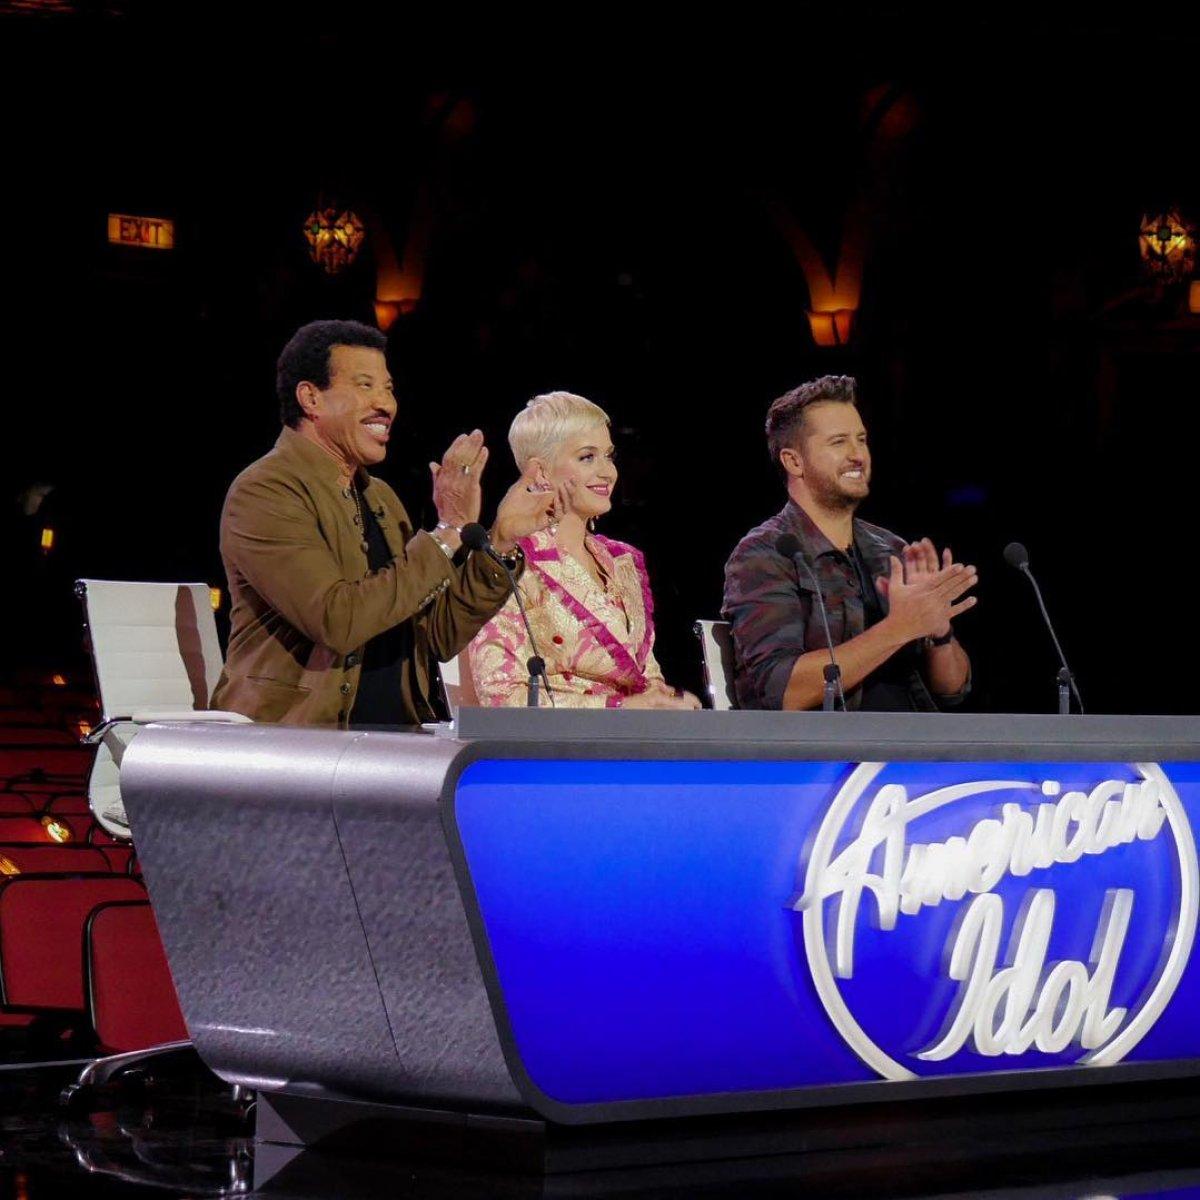 American Idol' Season 17 premiere date announced by ABC